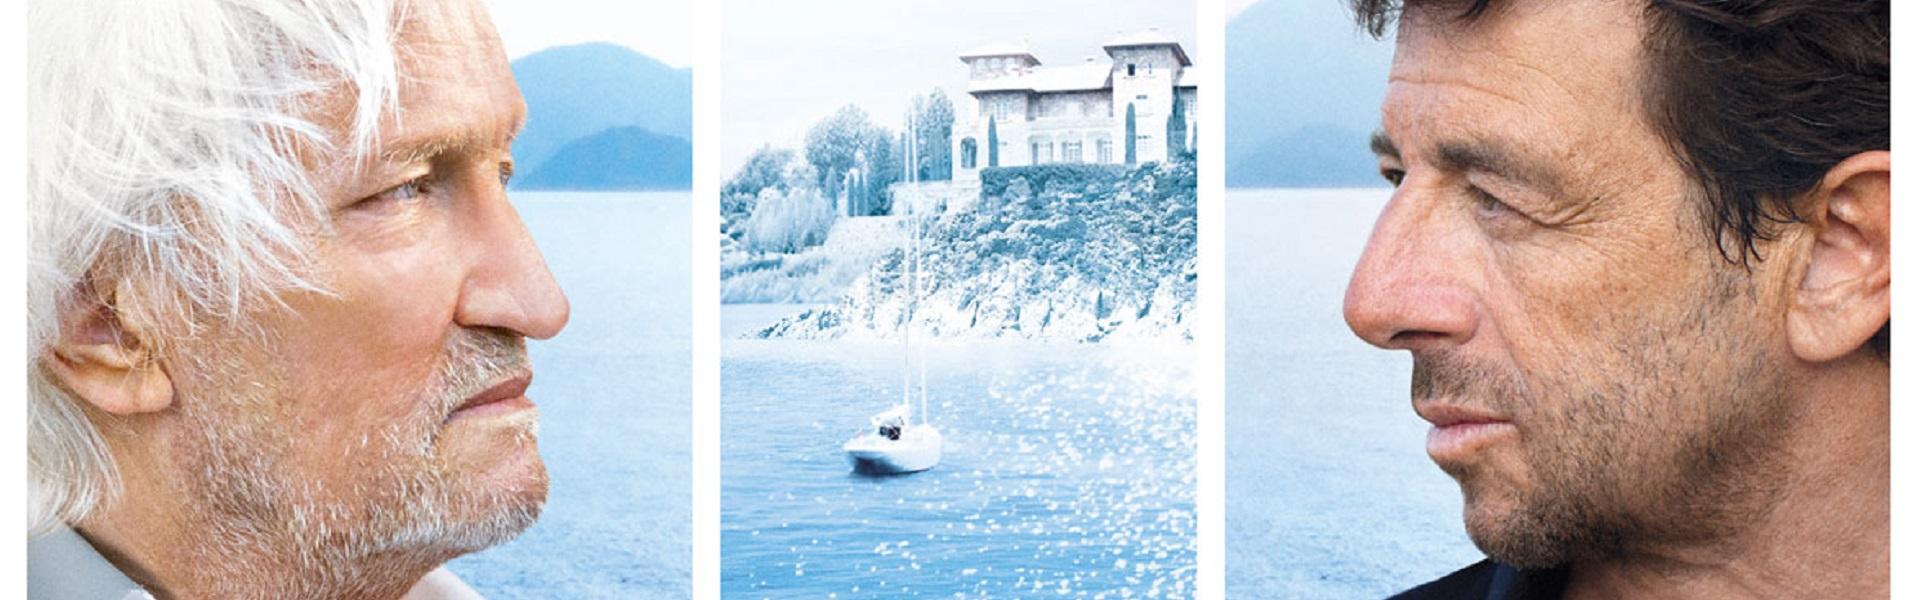 Background Villa Caprice